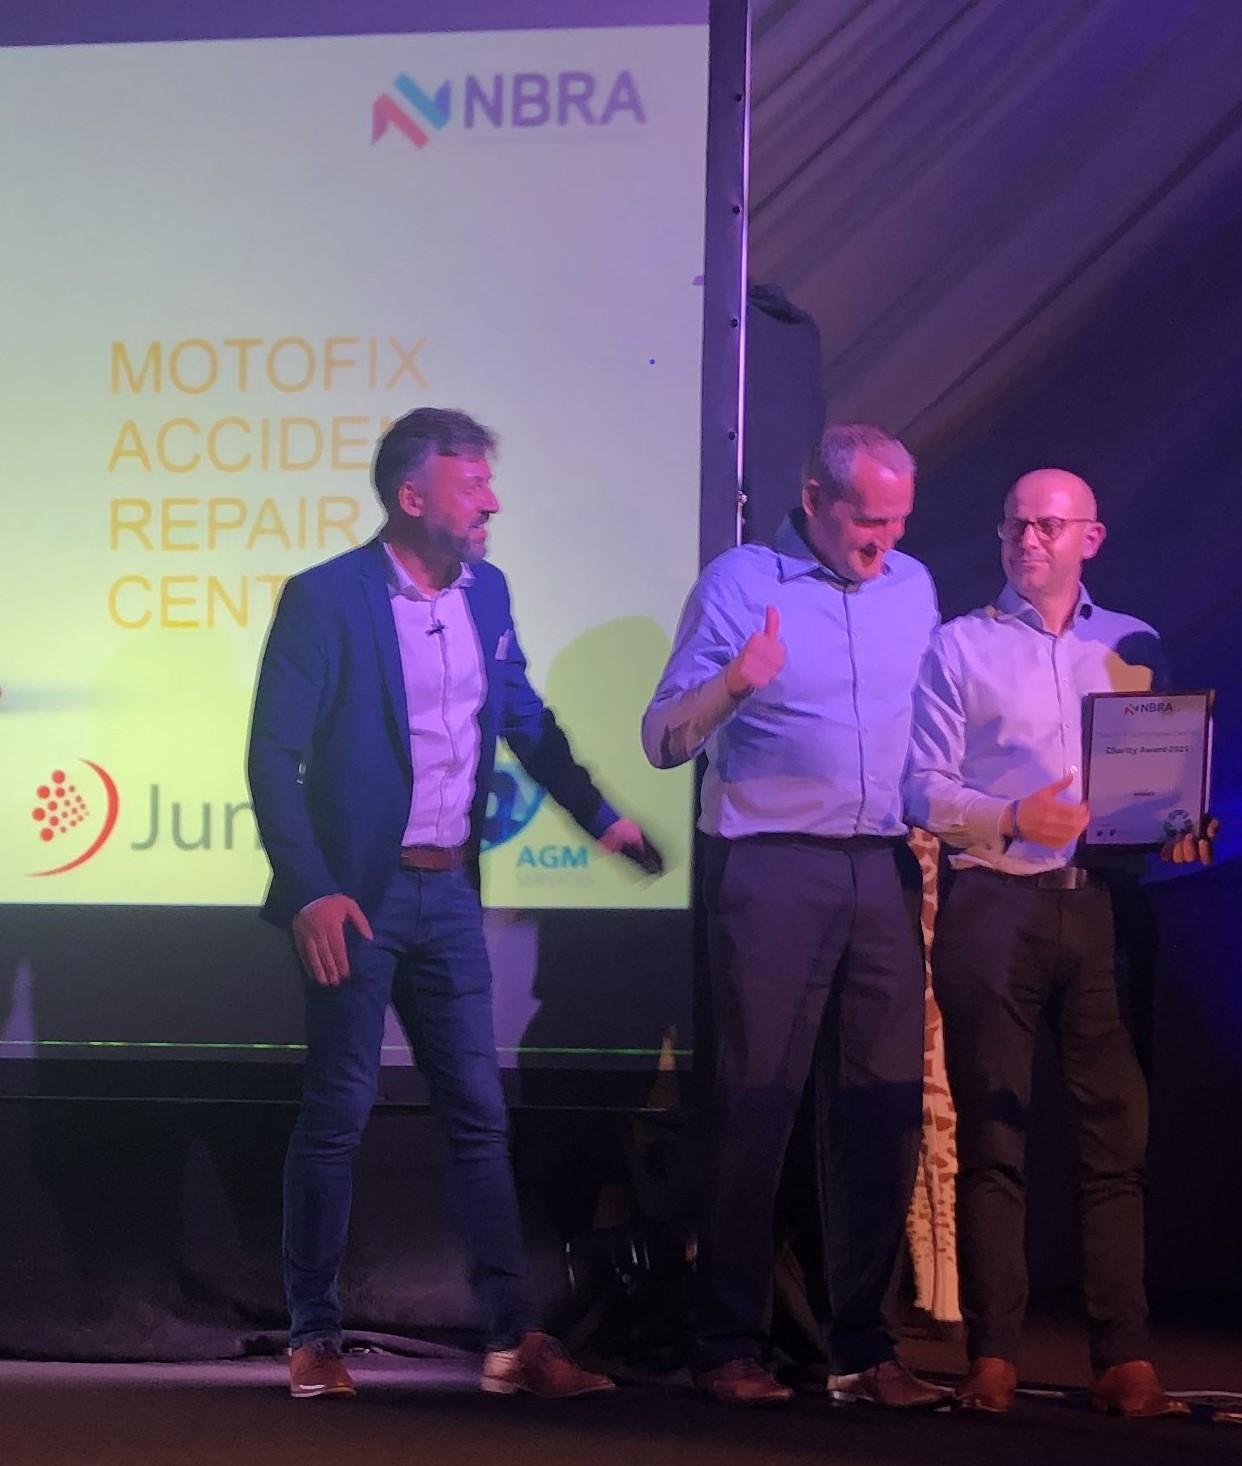 Motofix are WINNERS at the NBRA Greener Bodyshop Awards!